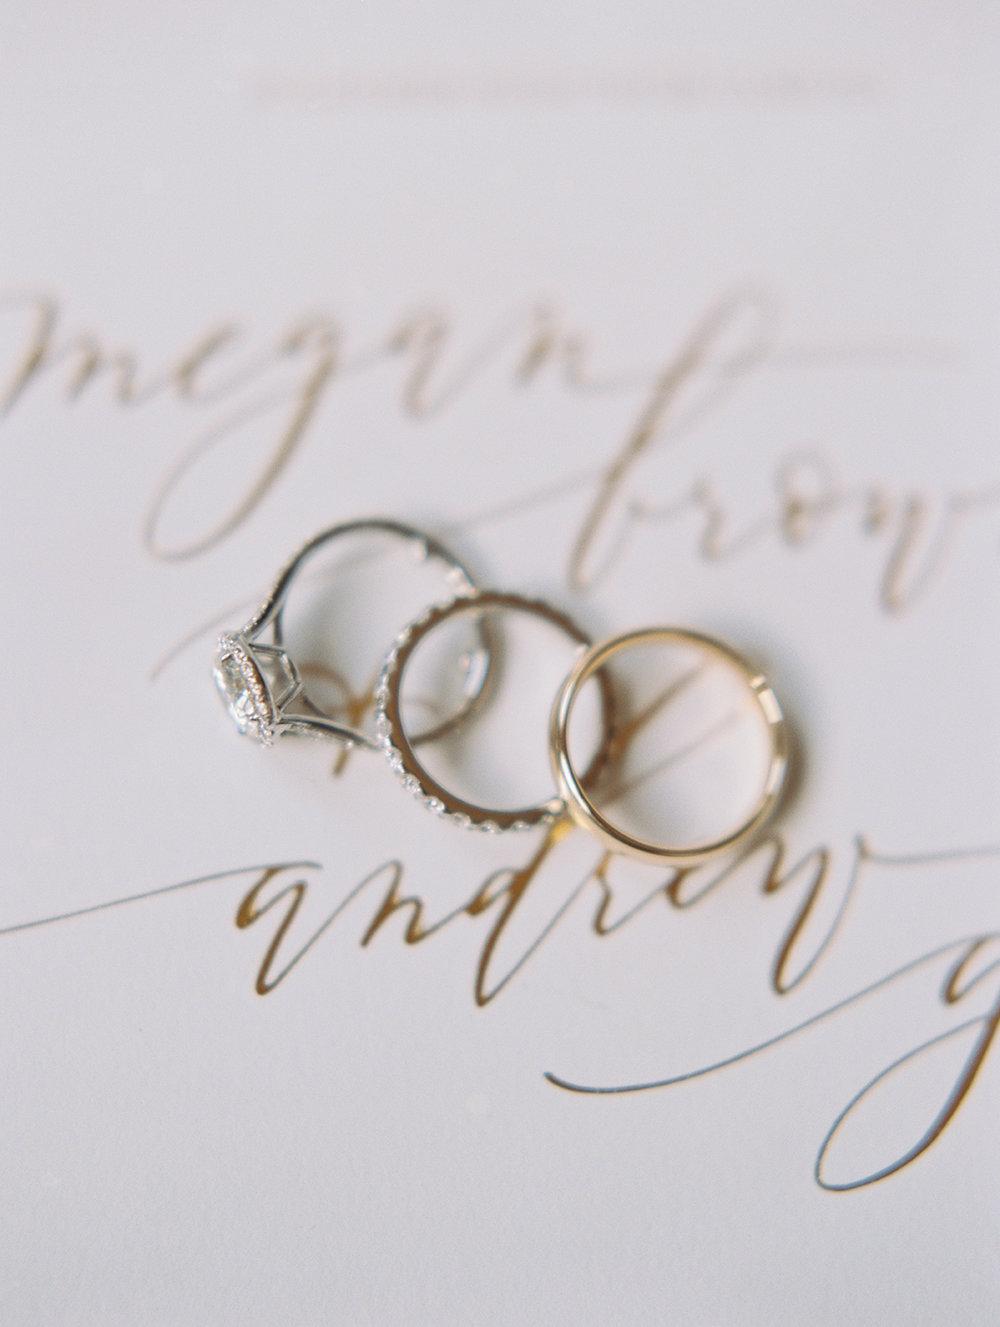 003-andrew-megan-boston-public-library-wedding-film-photographer.jpg